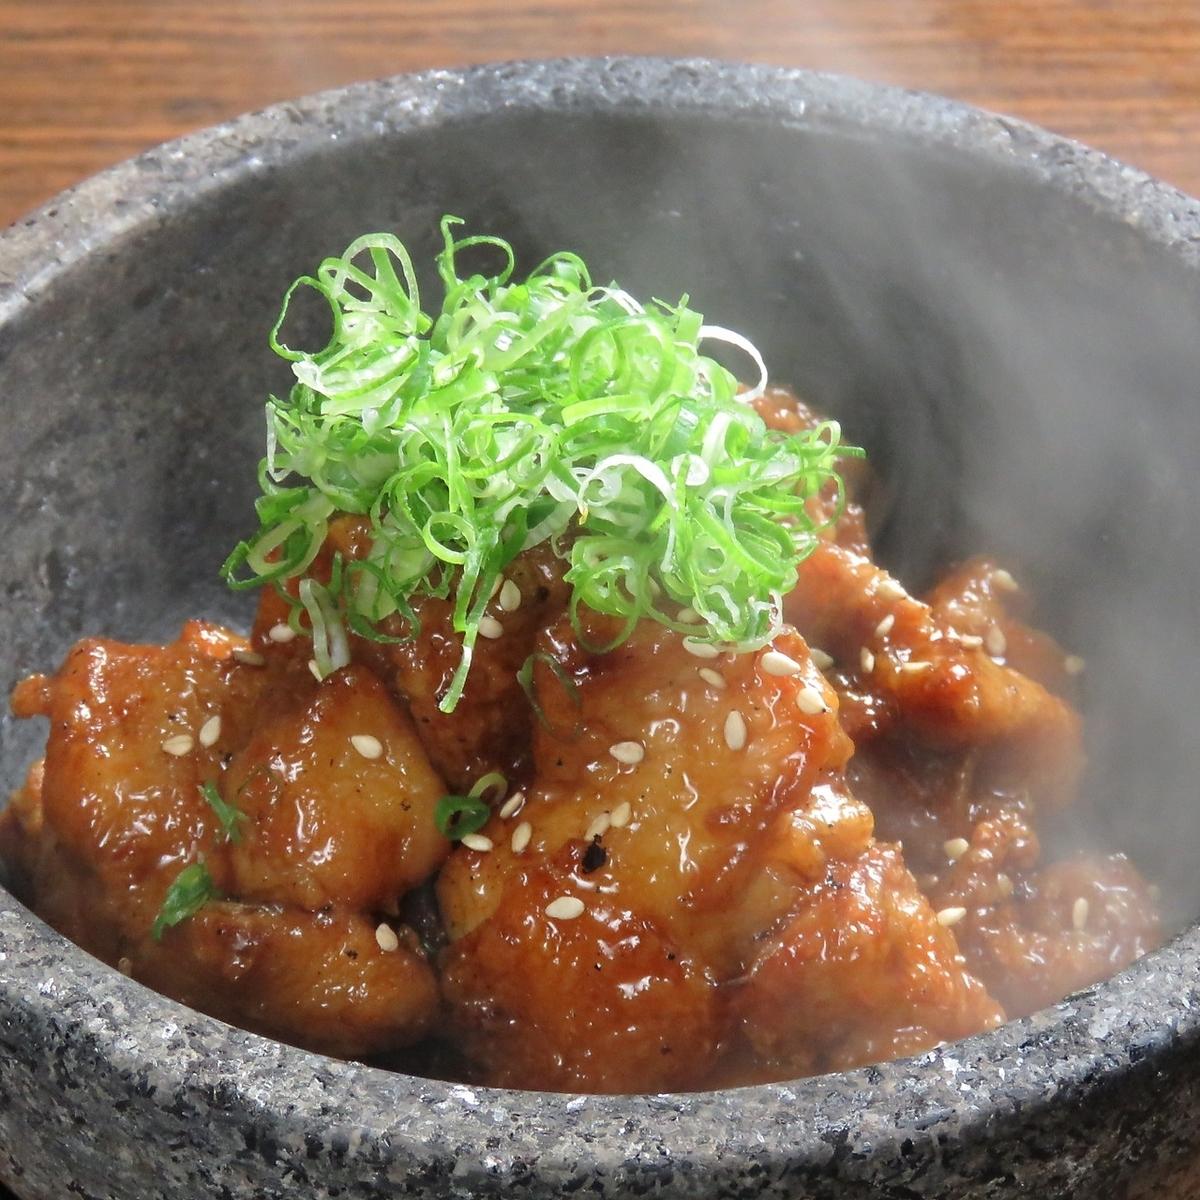 Stone-cooked jujuu chicken